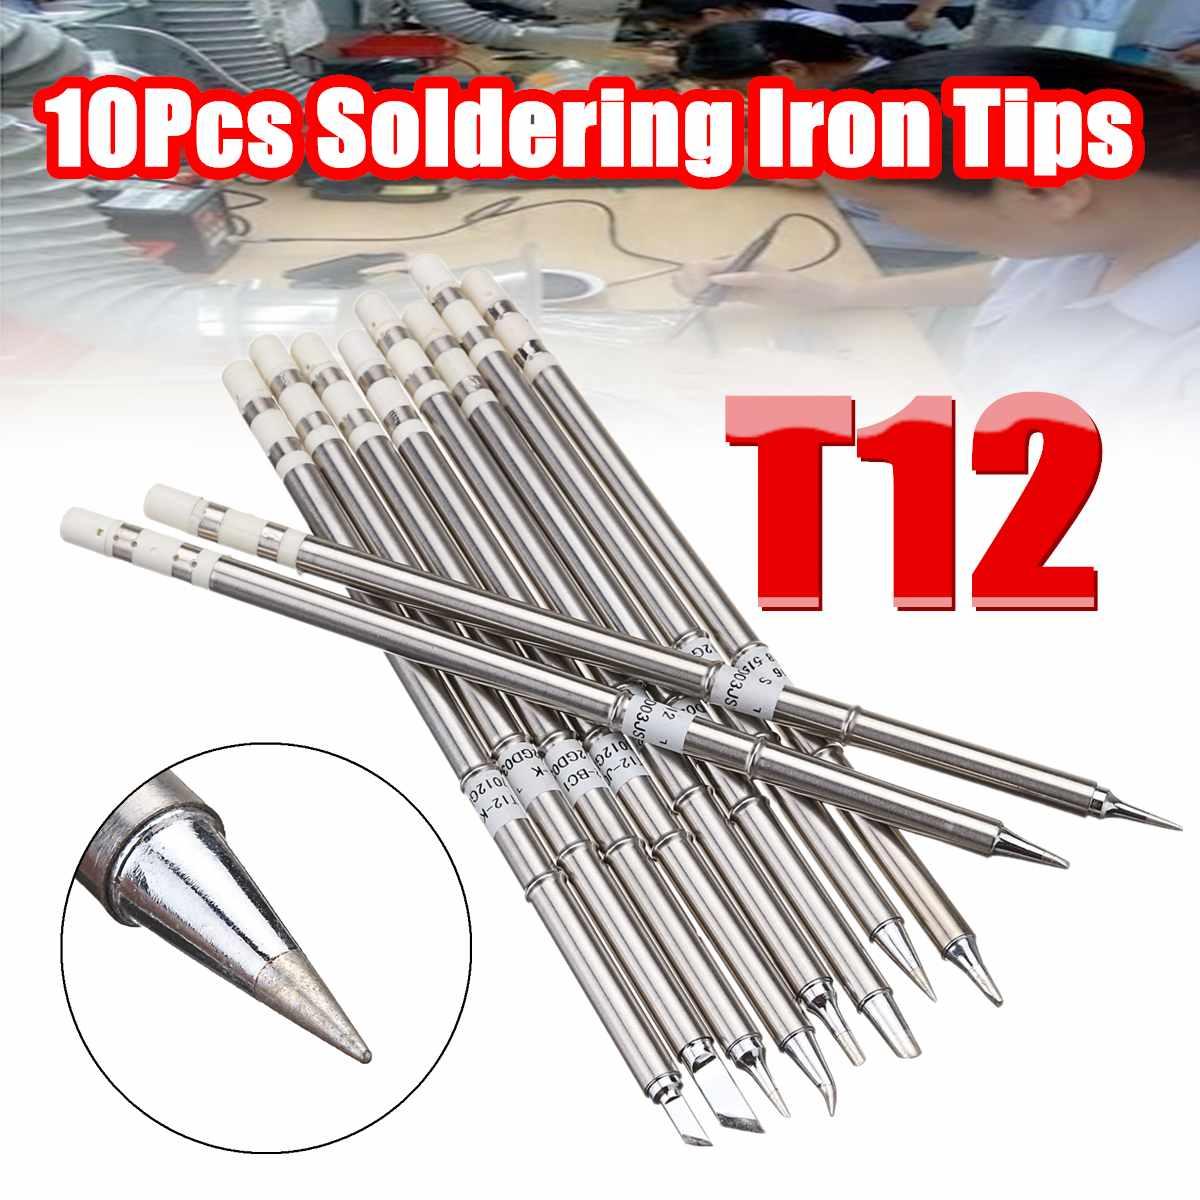 Drillpro 10pcs T12 Soldering Iron Tips Set Soldering Alloy Iron Tips Lead-free Solder Tips Welding Head Soldering Tools 155mm